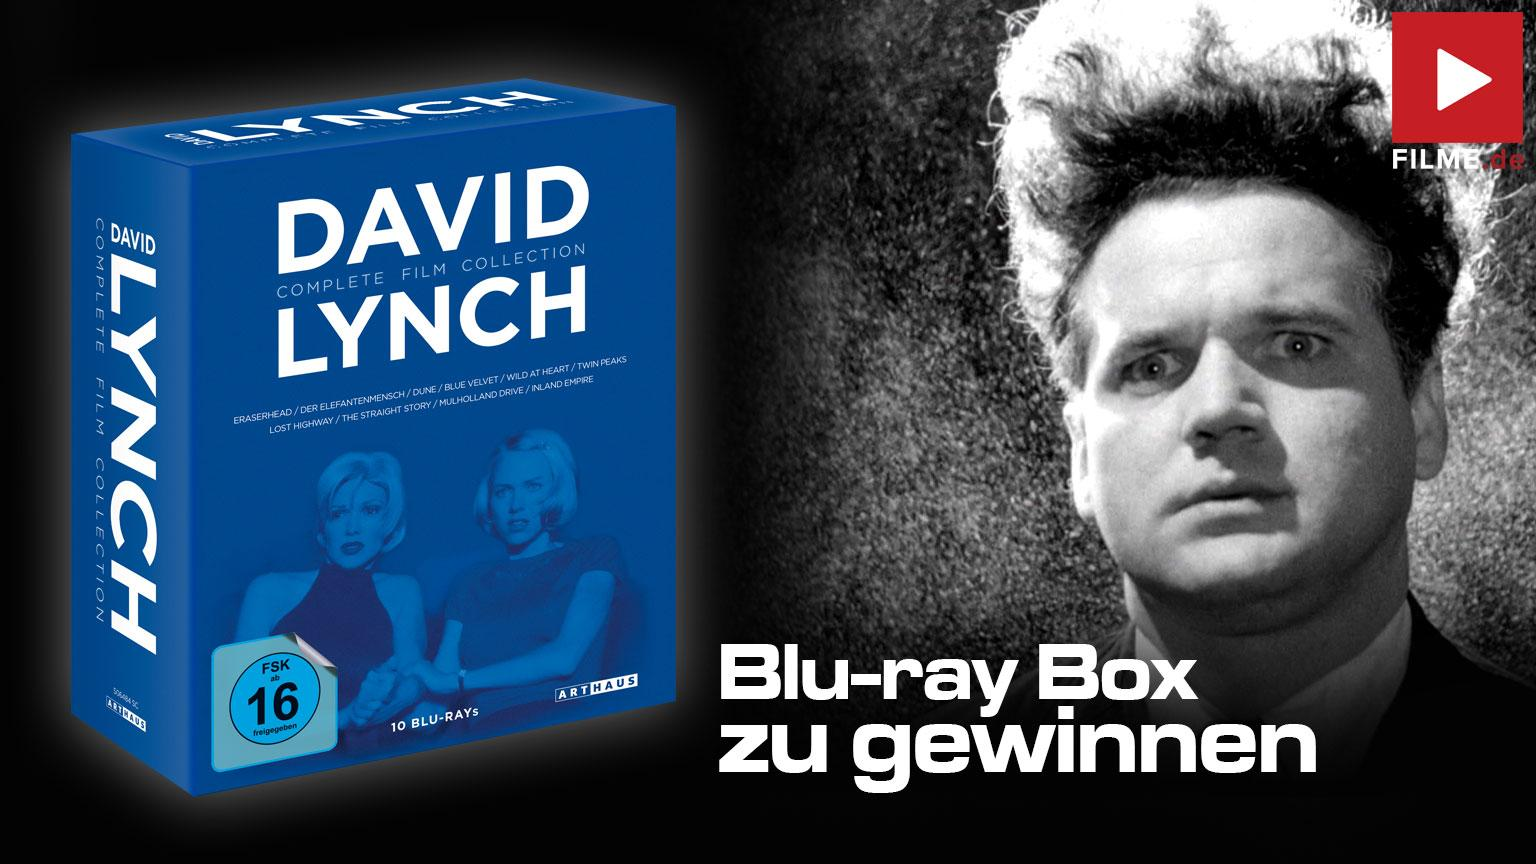 David Lynch Blu-ray Box Gewinnspiel Artikelbild